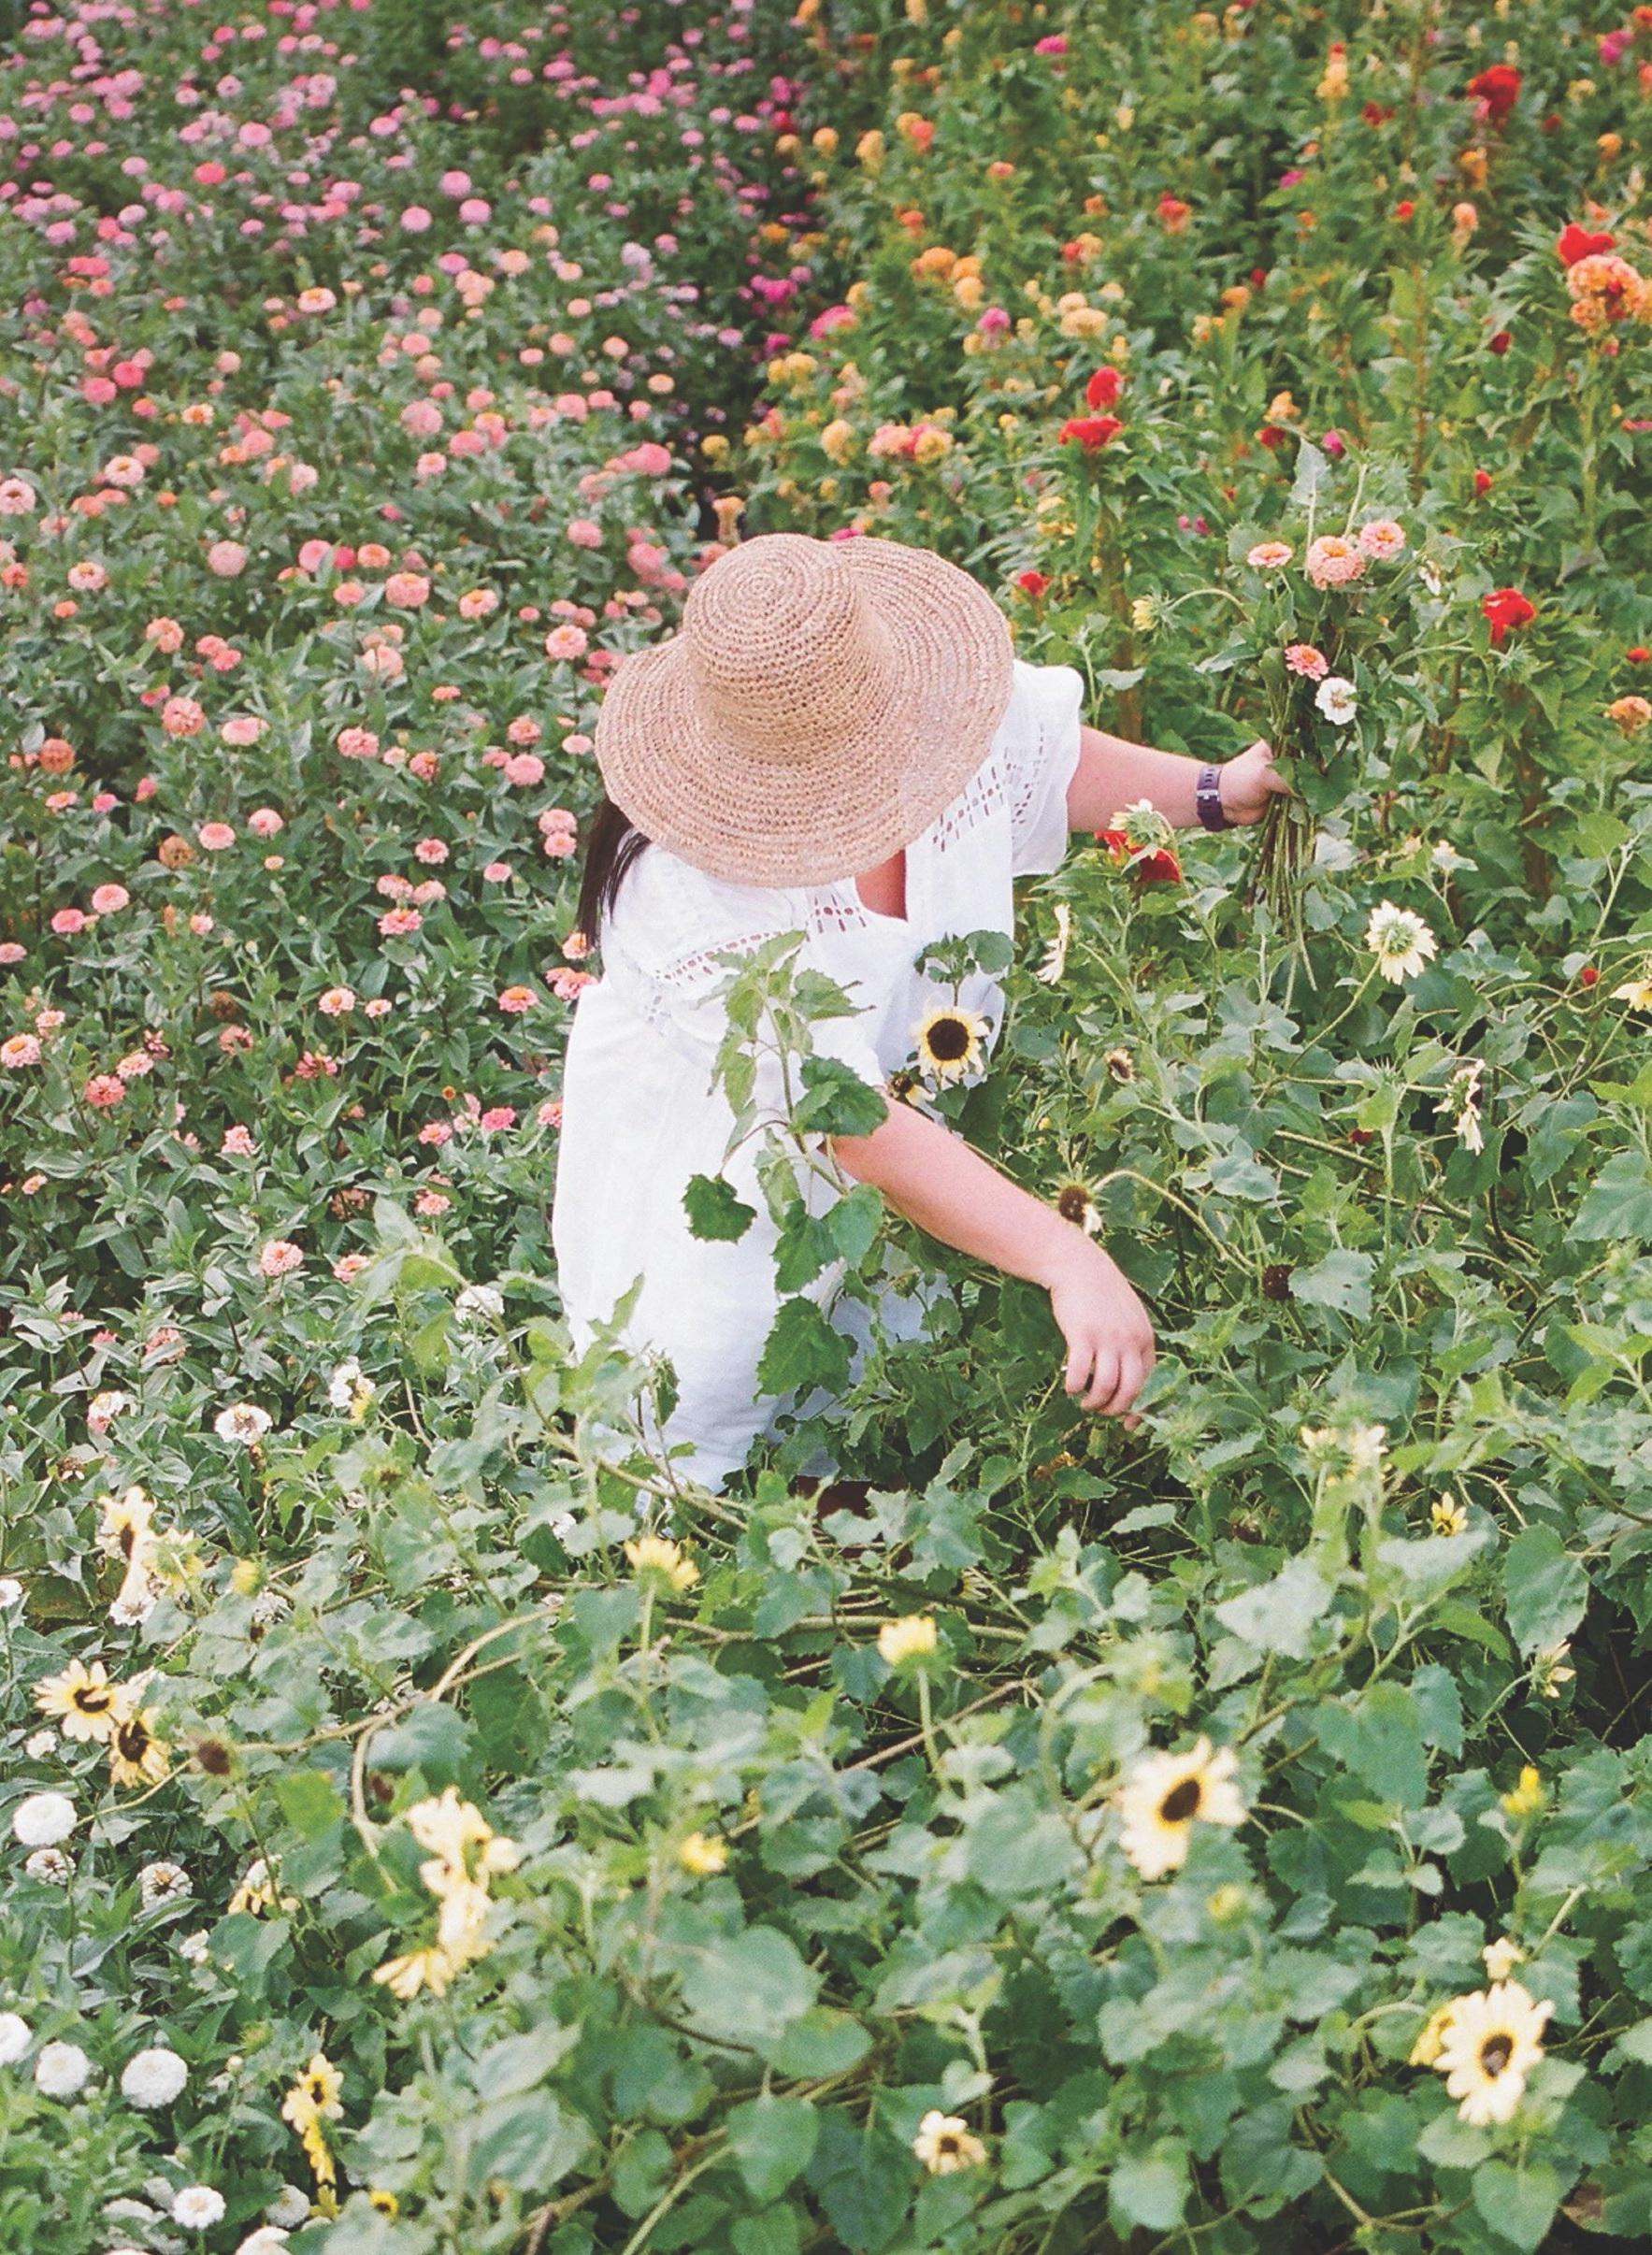 Butterbee Flower farm in Maryland. Photo by Kate Headley.